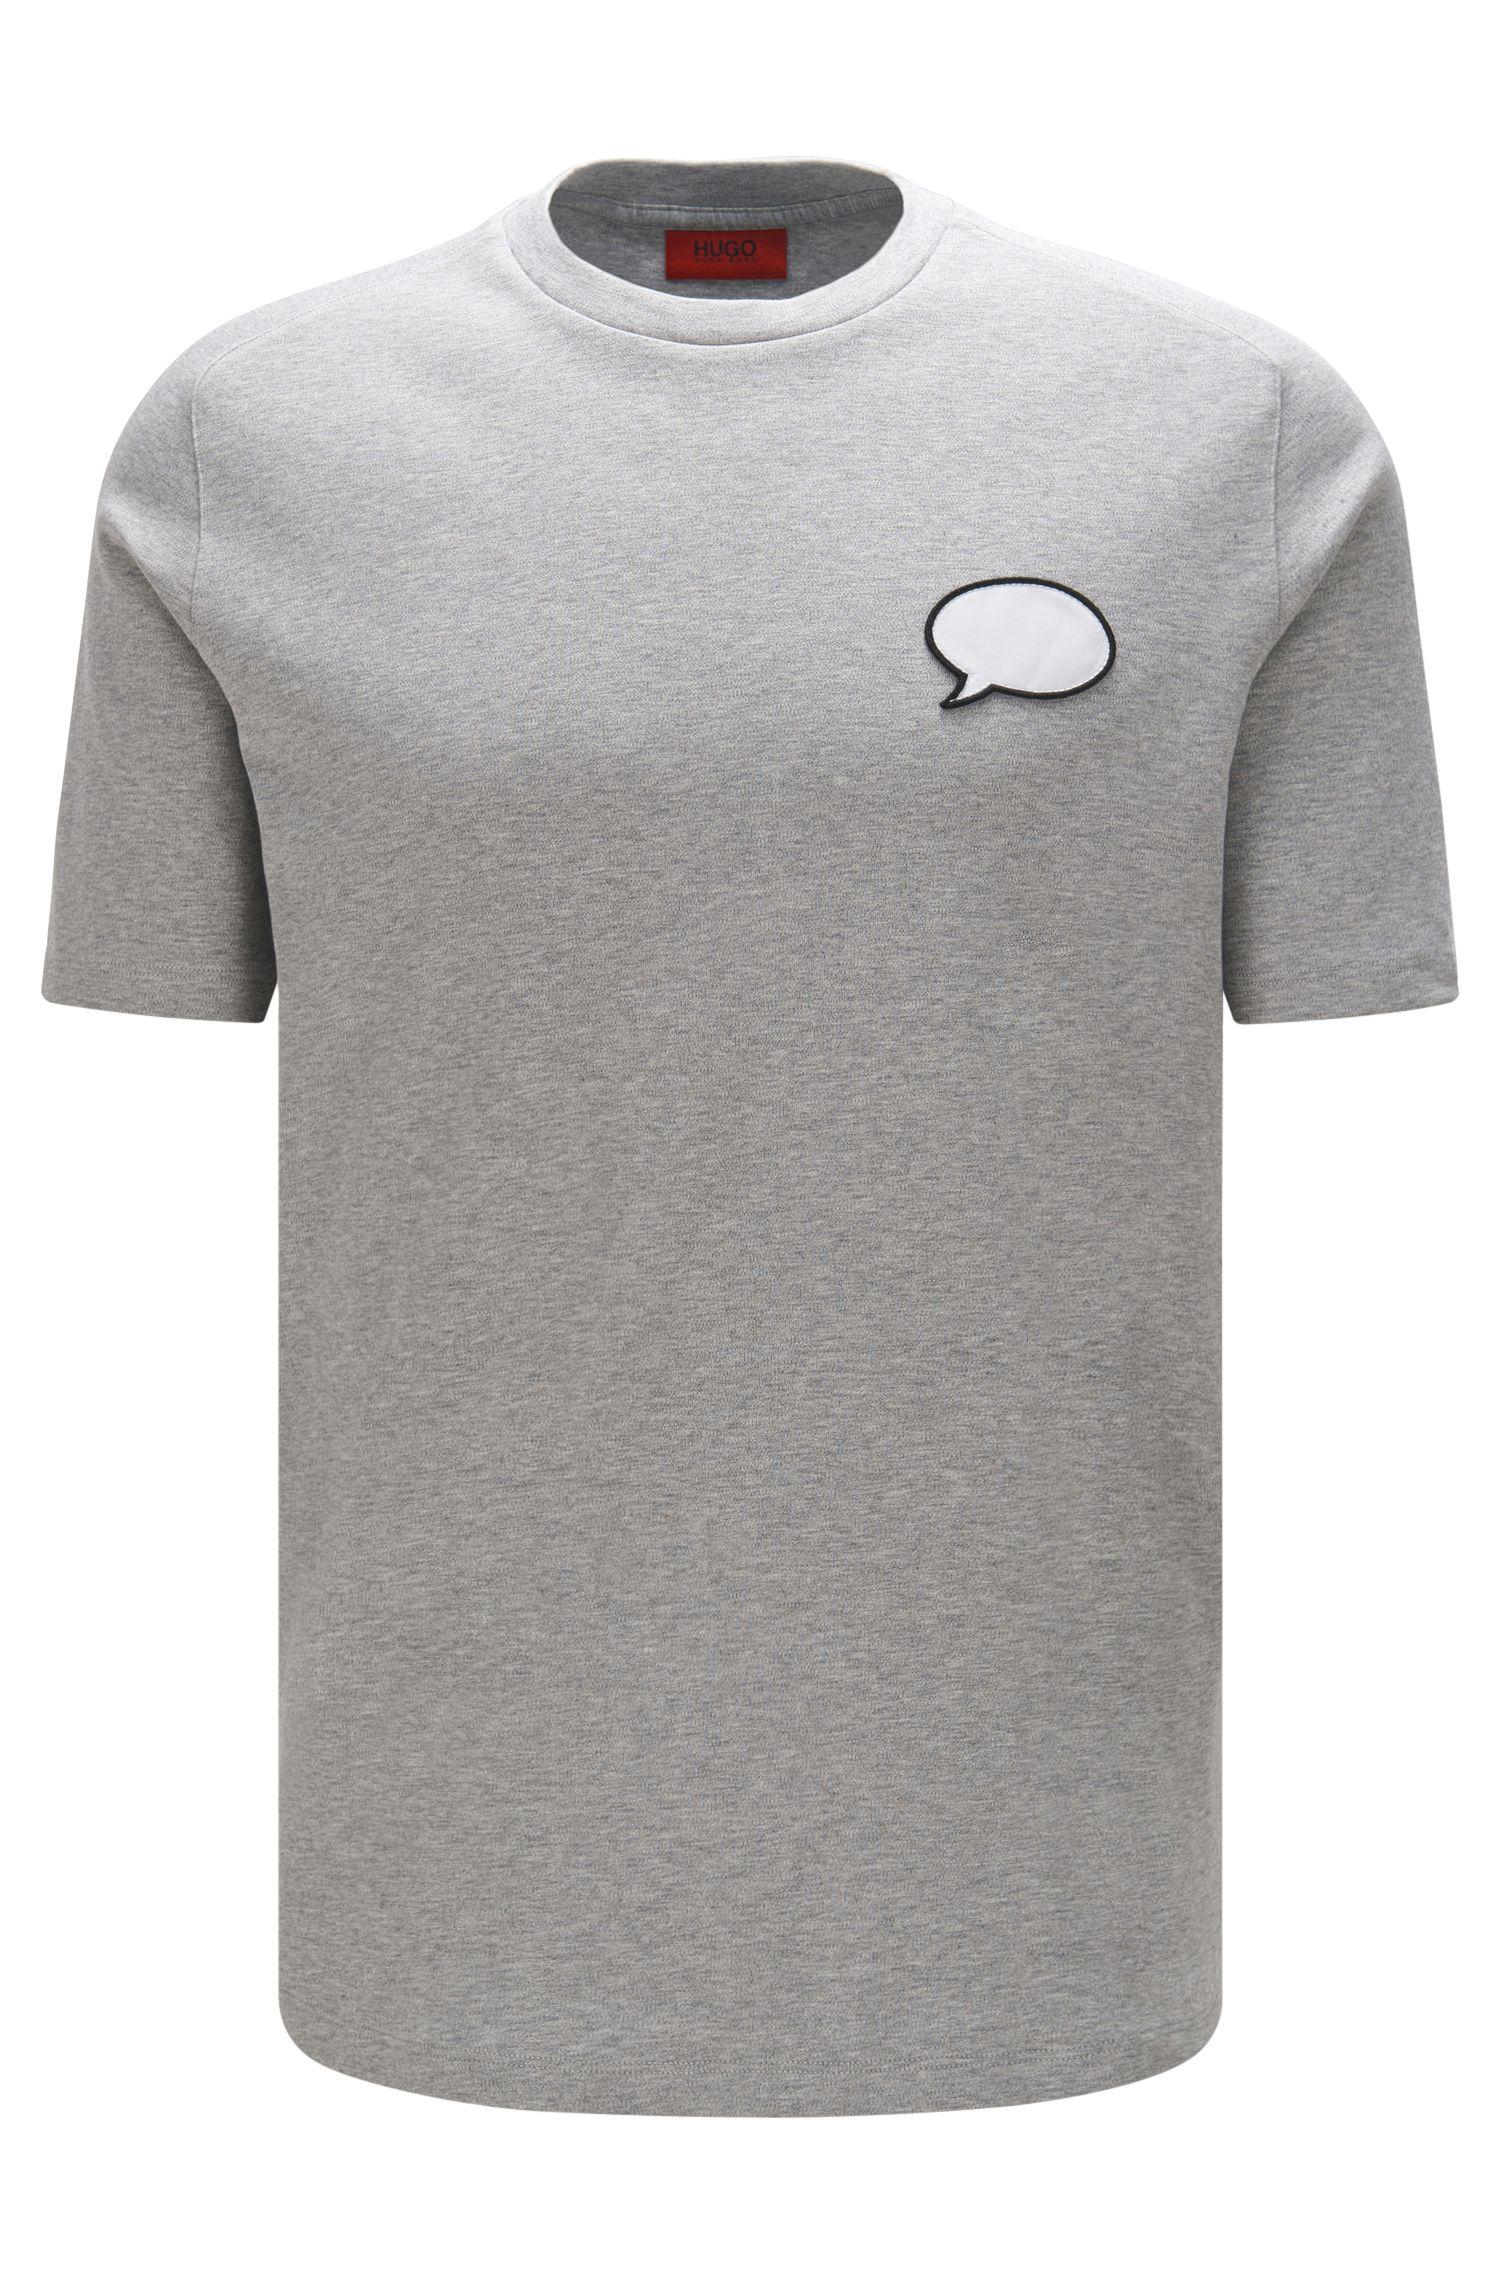 Regular-fit short-sleeved sweatshirt in cotton: 'Denlo'